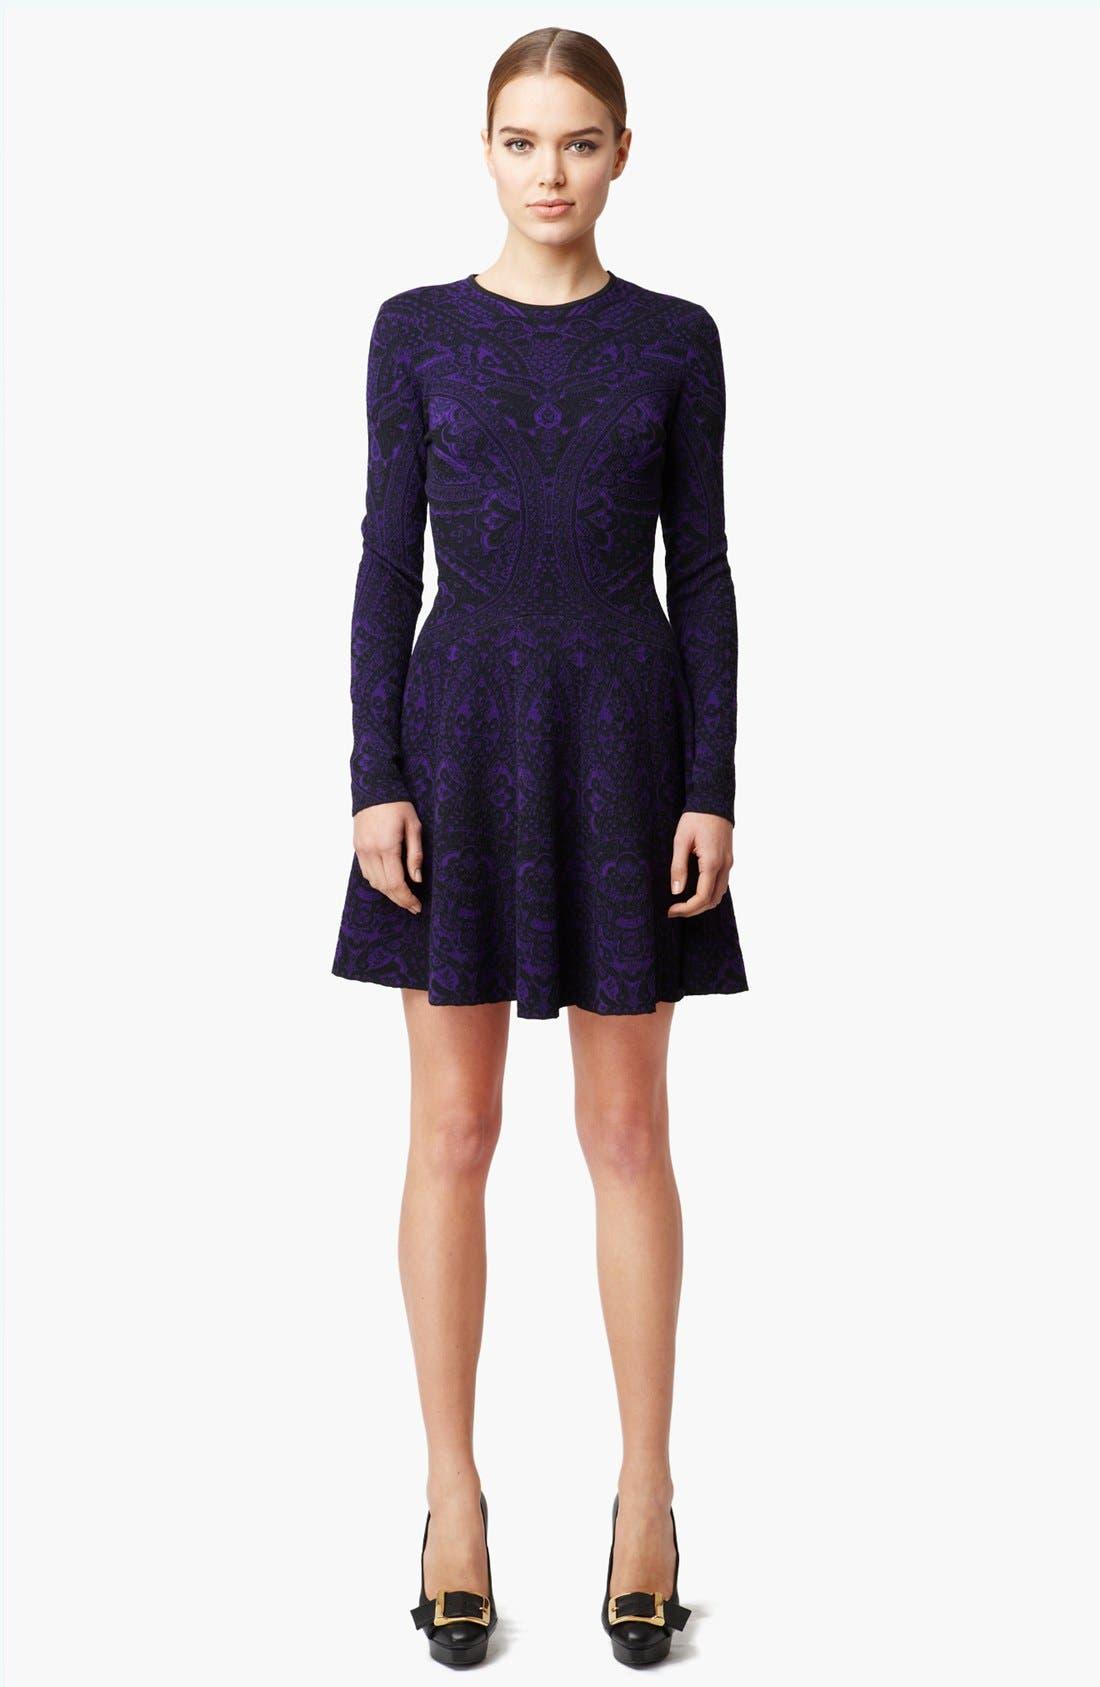 Main Image - Alexander McQueen Full Skirt Intarsia Knit Dress